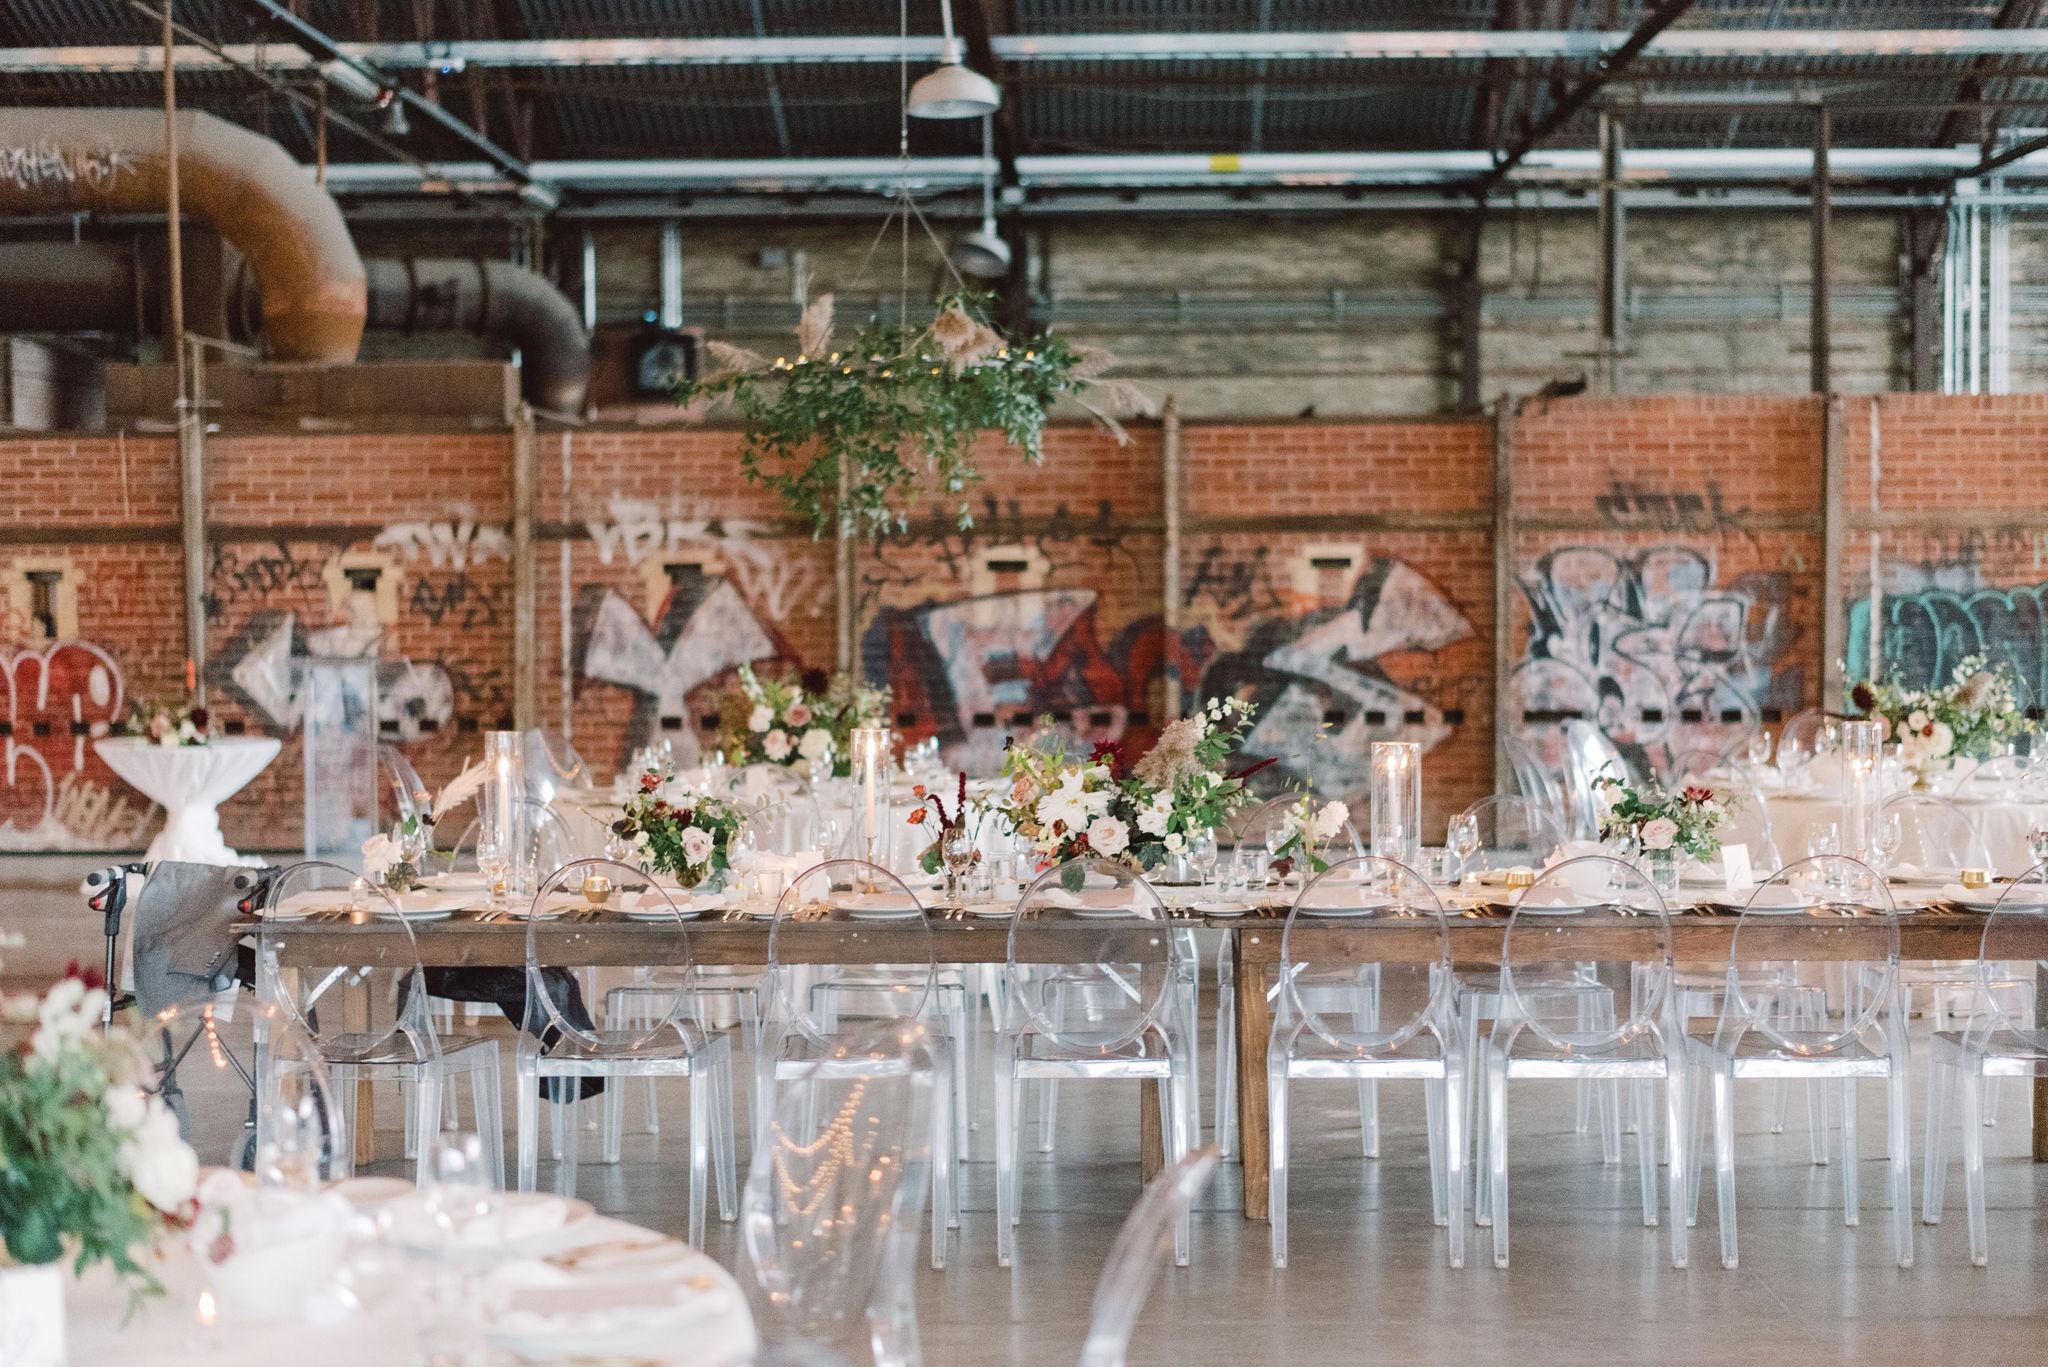 1374-artiese-evergreen-brickworks-wedding-ashleycraig-10537.jpg